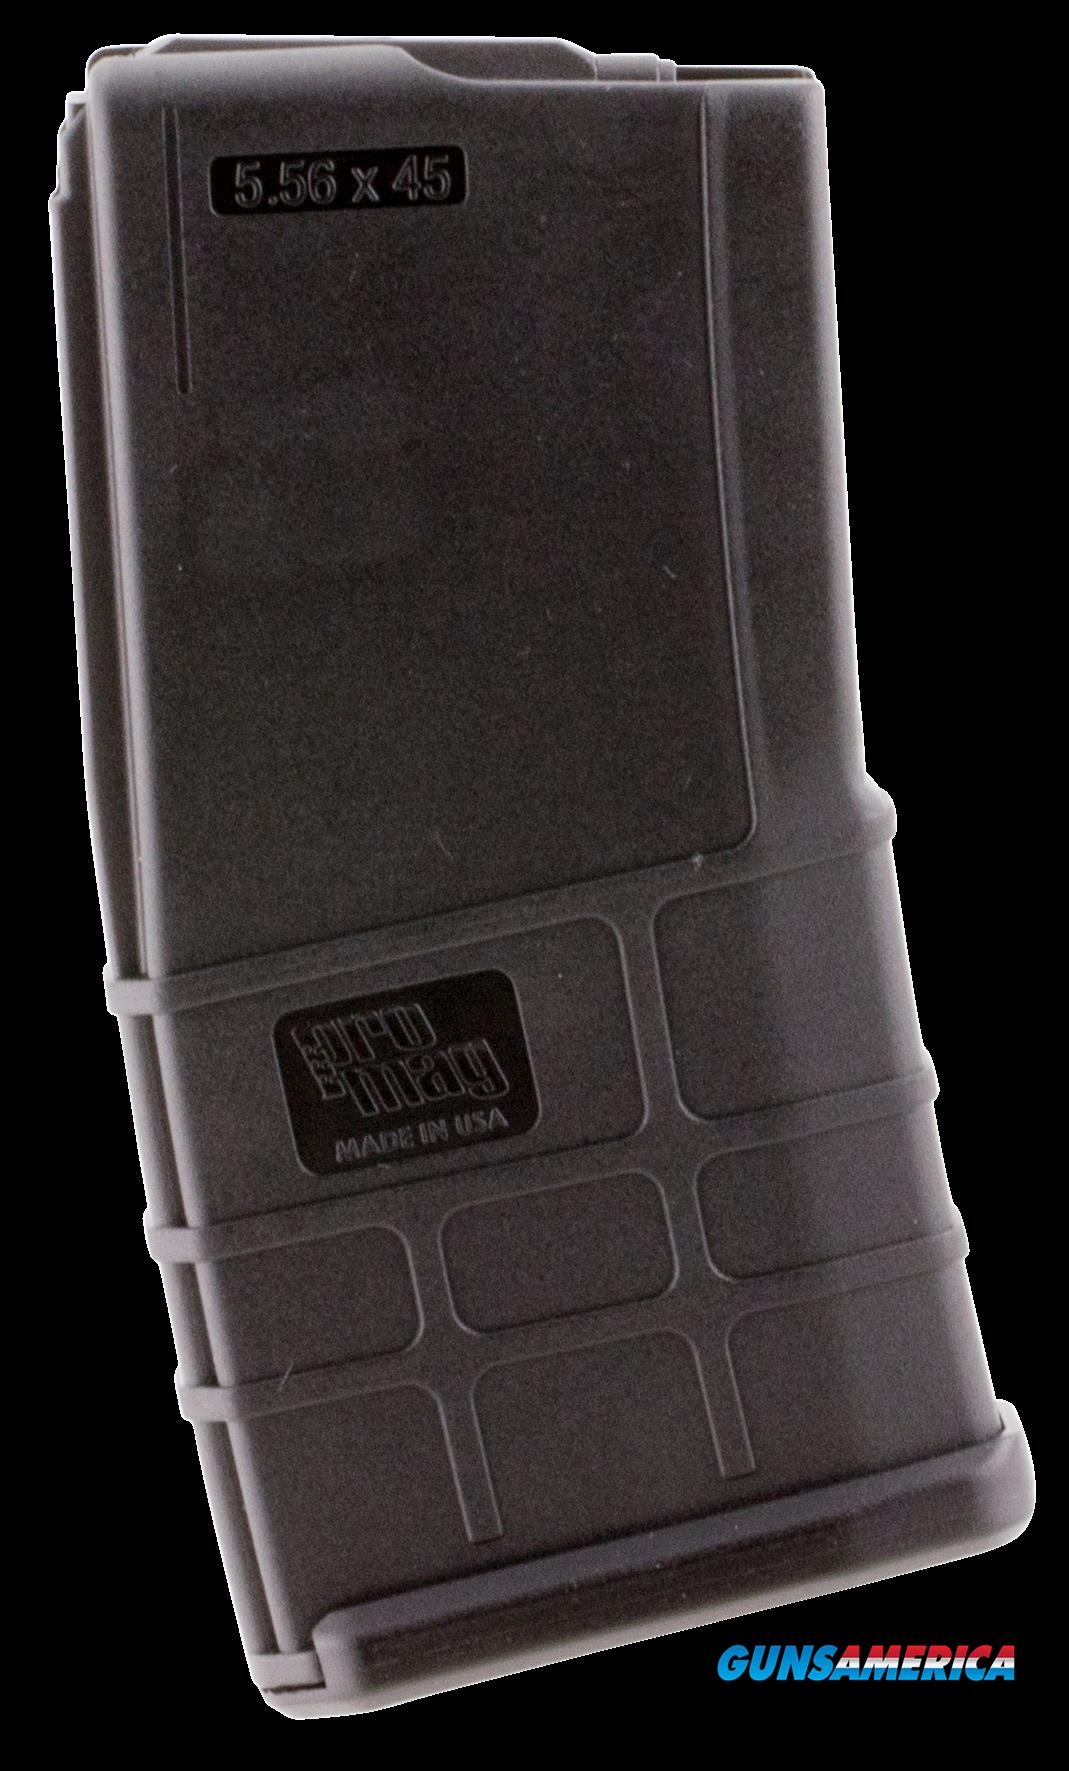 Promag Ar-15, Pro Cola9b  Mag Ar15 223        20rd Poly  Guns > Pistols > 1911 Pistol Copies (non-Colt)